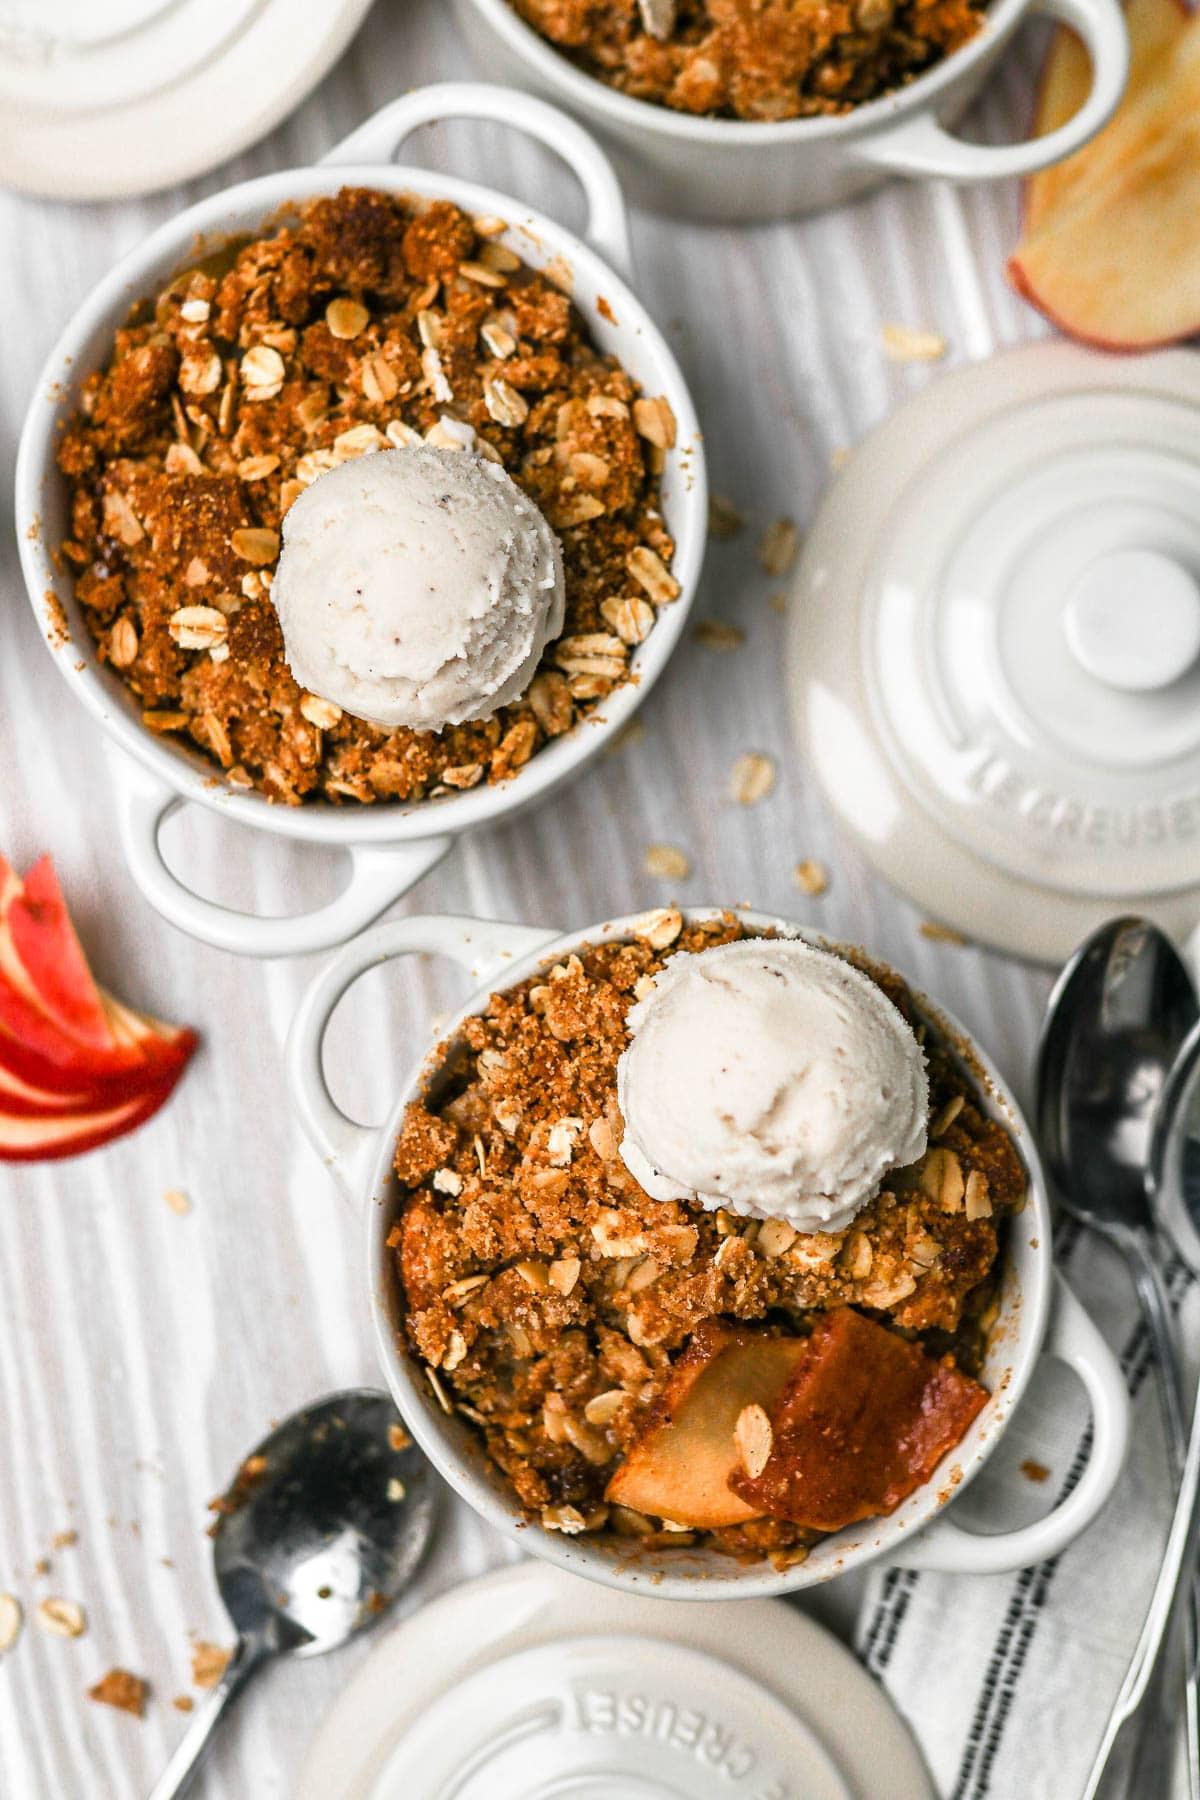 Two baked apple crisp ramekins with ice cream scoop on top.